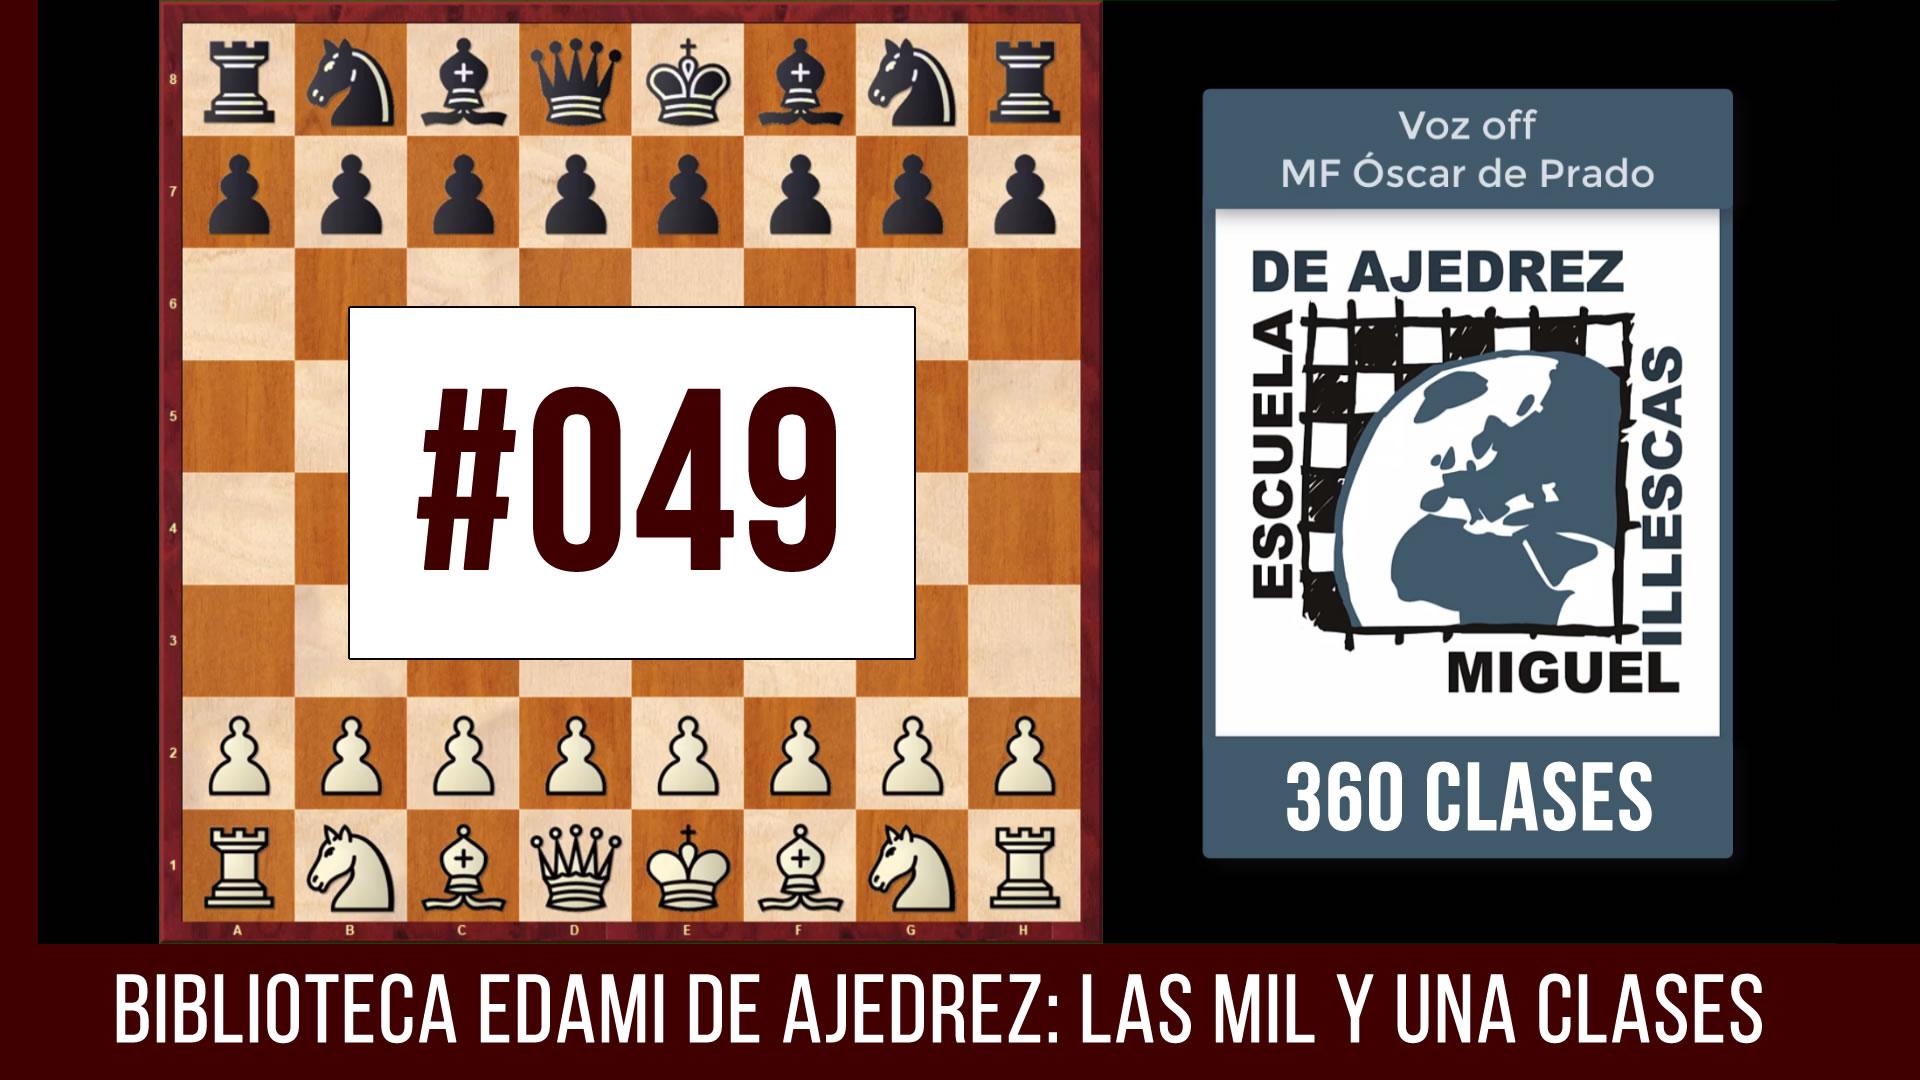 Clases de ajedrez #049 - EDAMI